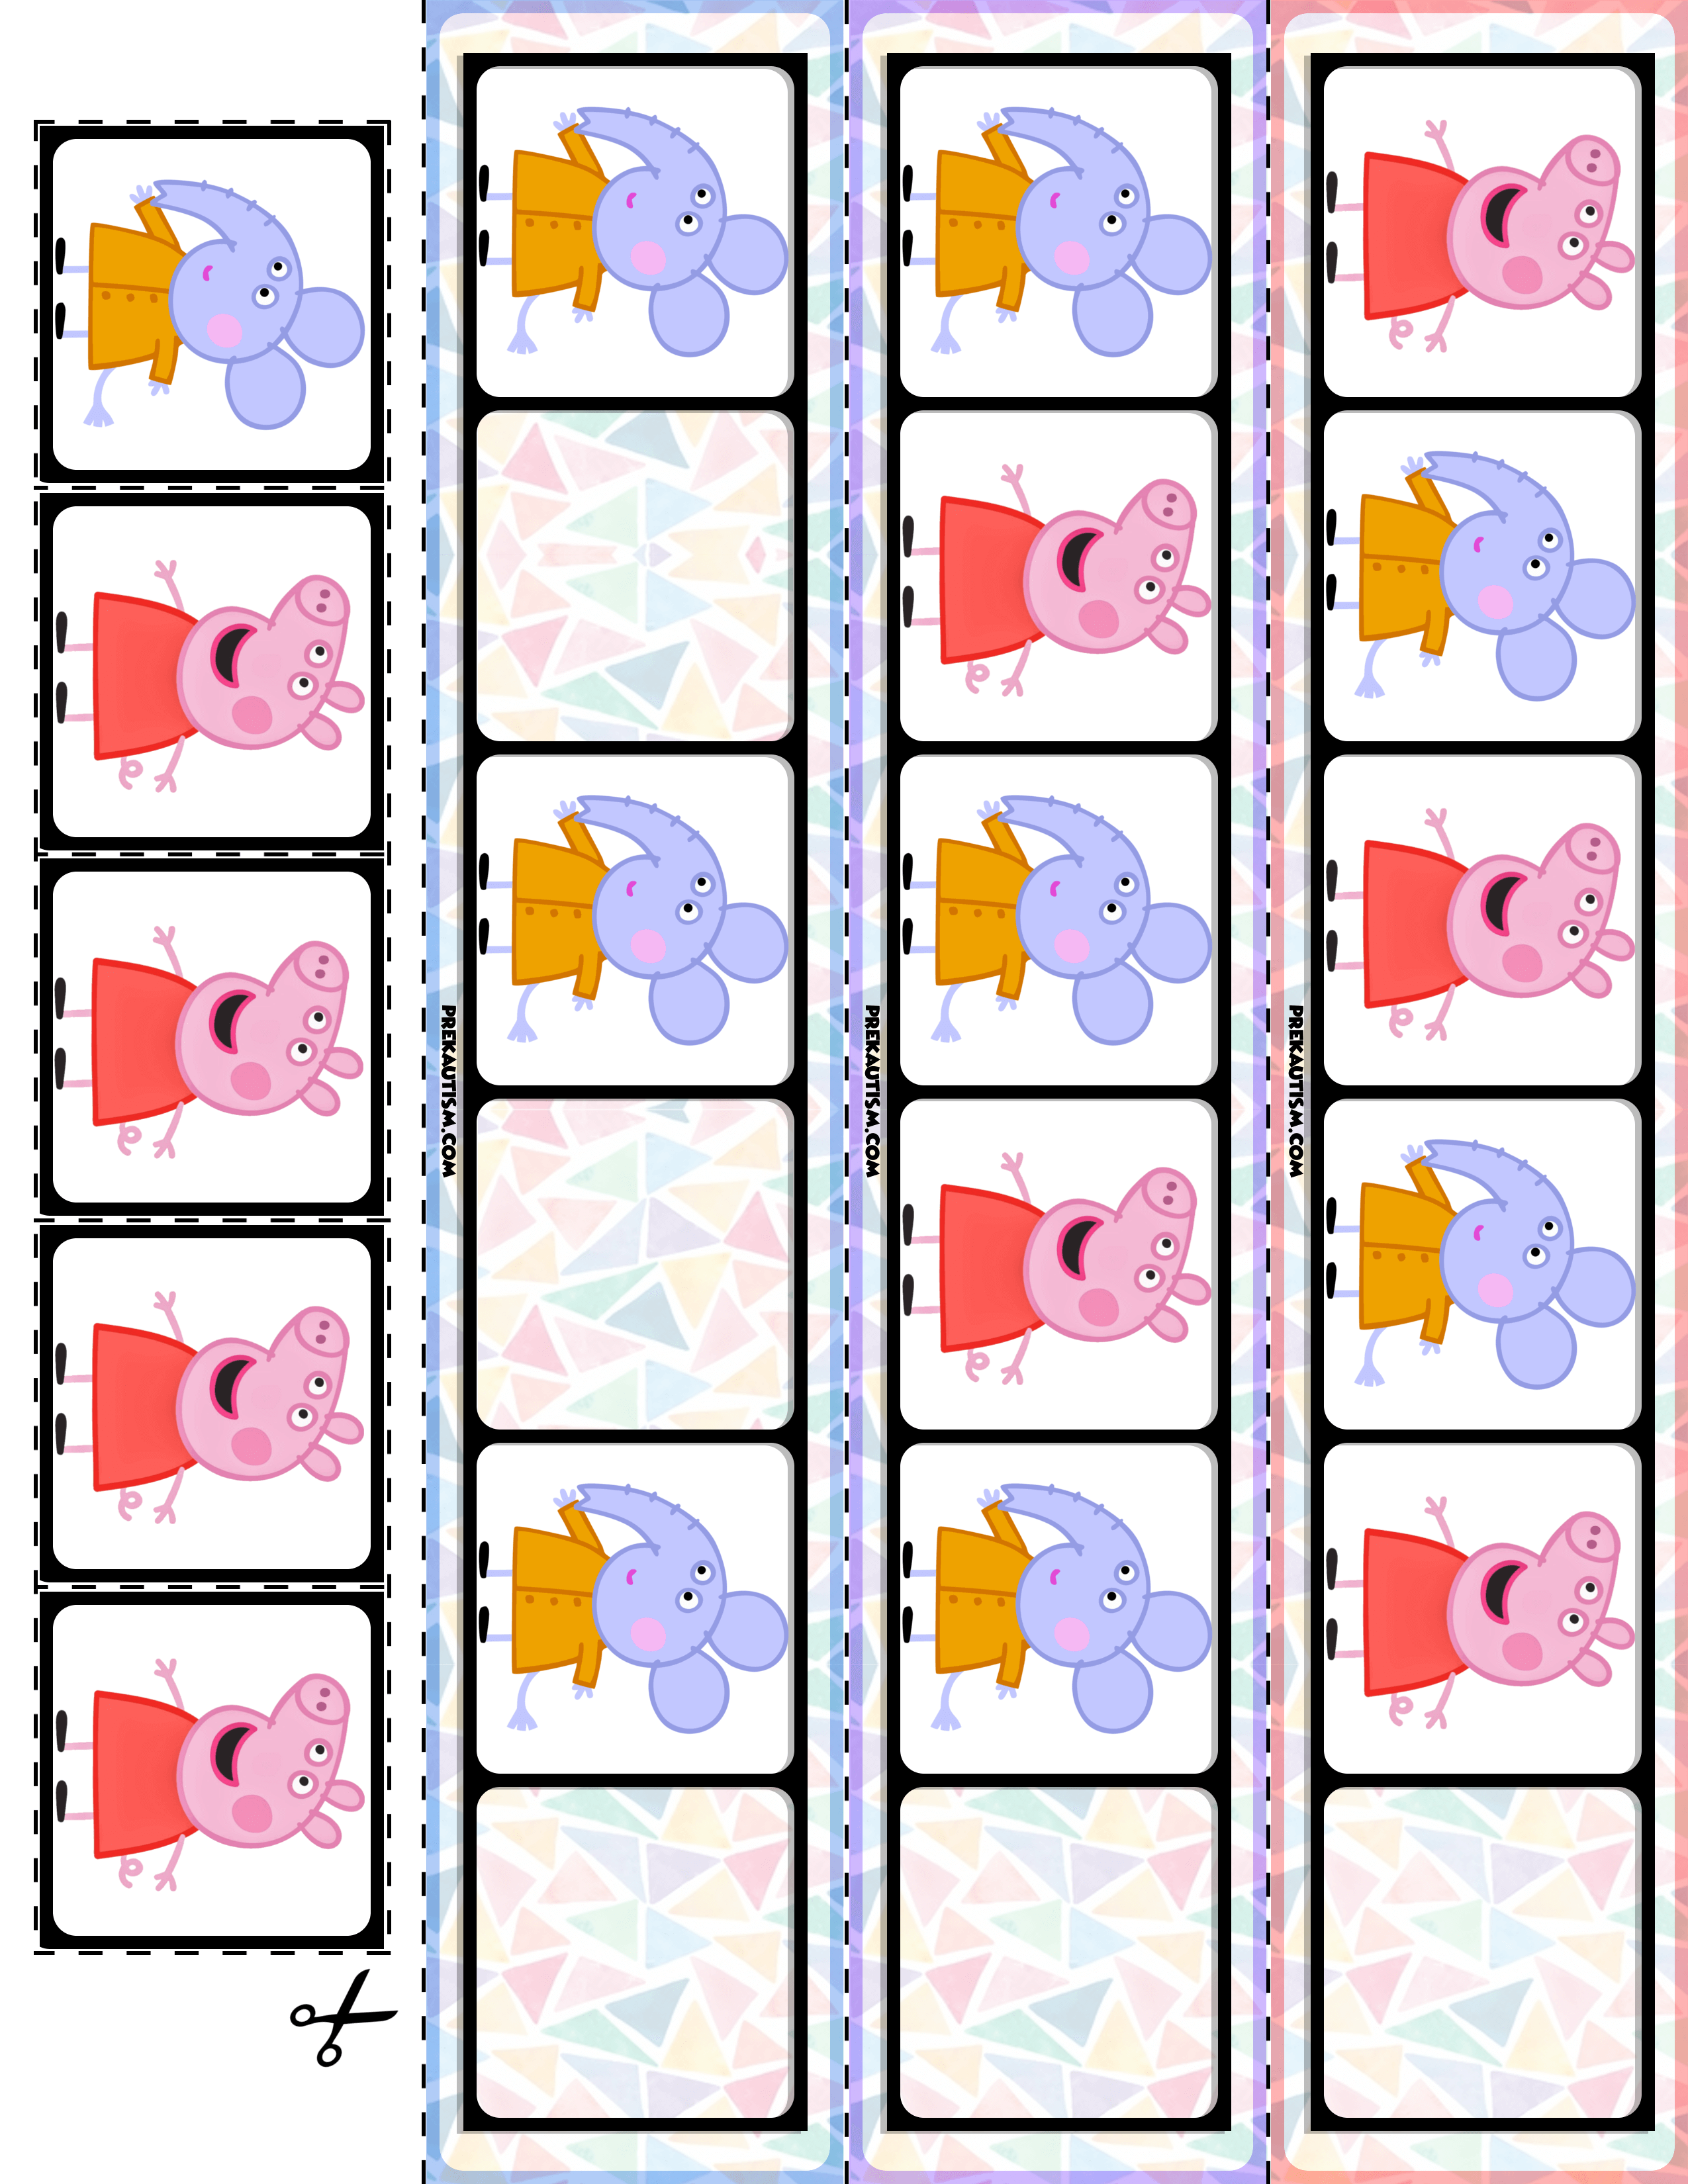 Preschool Peppa Pig Pattern Cards Preschool Pattern Printables Pattern Cards Preschool Preschool Patterns [ 3300 x 2550 Pixel ]